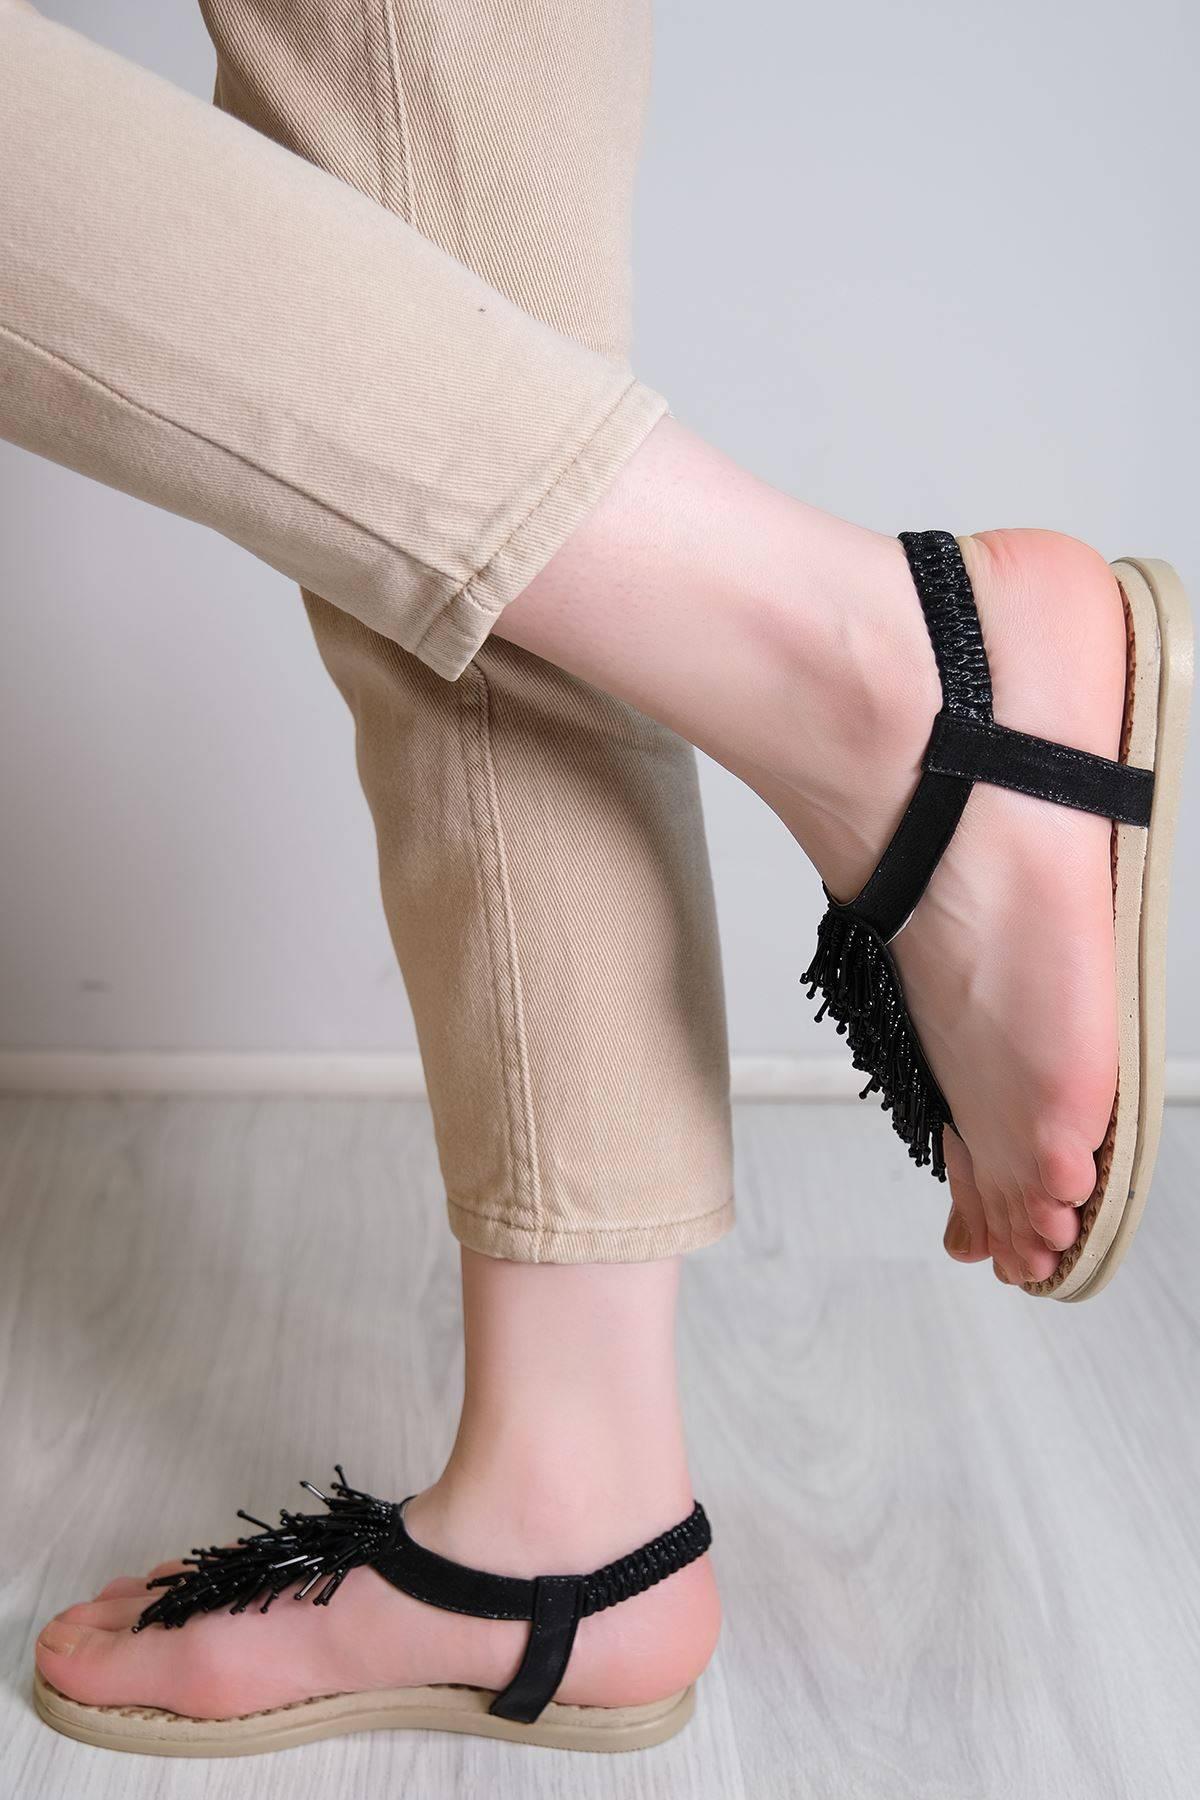 Parmak Arası Sandalet Siyah - 6111.264.